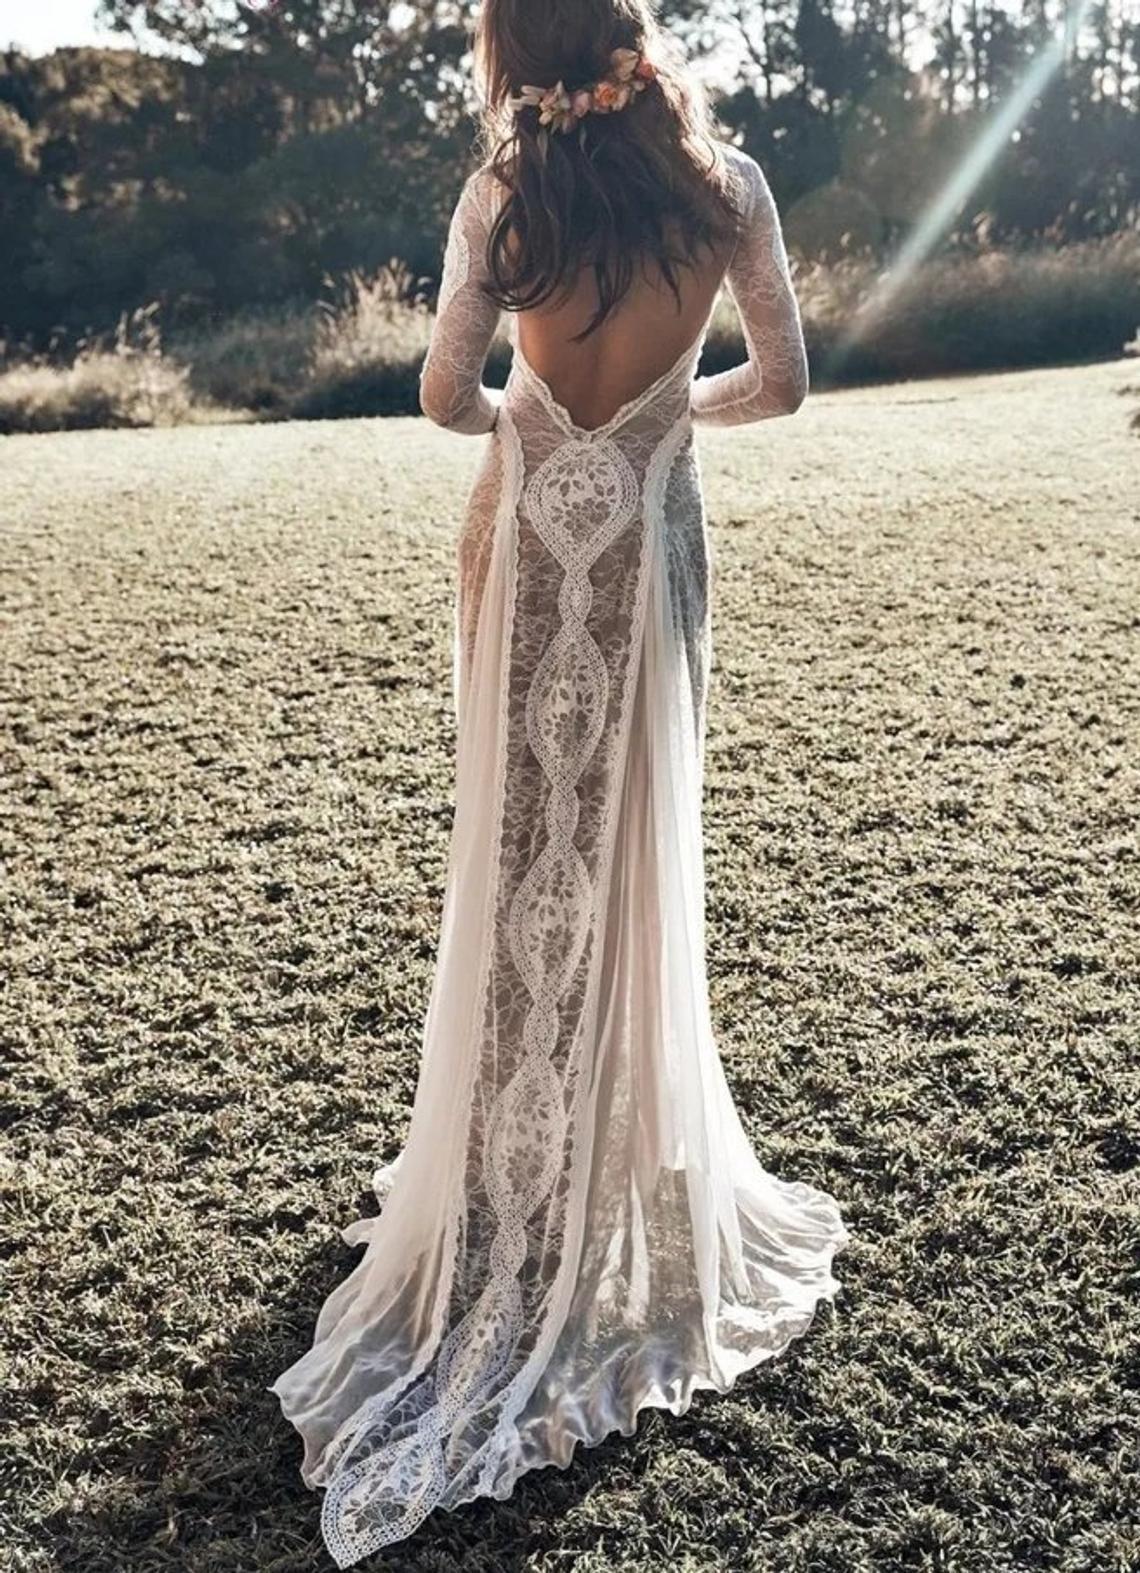 Pin on Prom/wedding